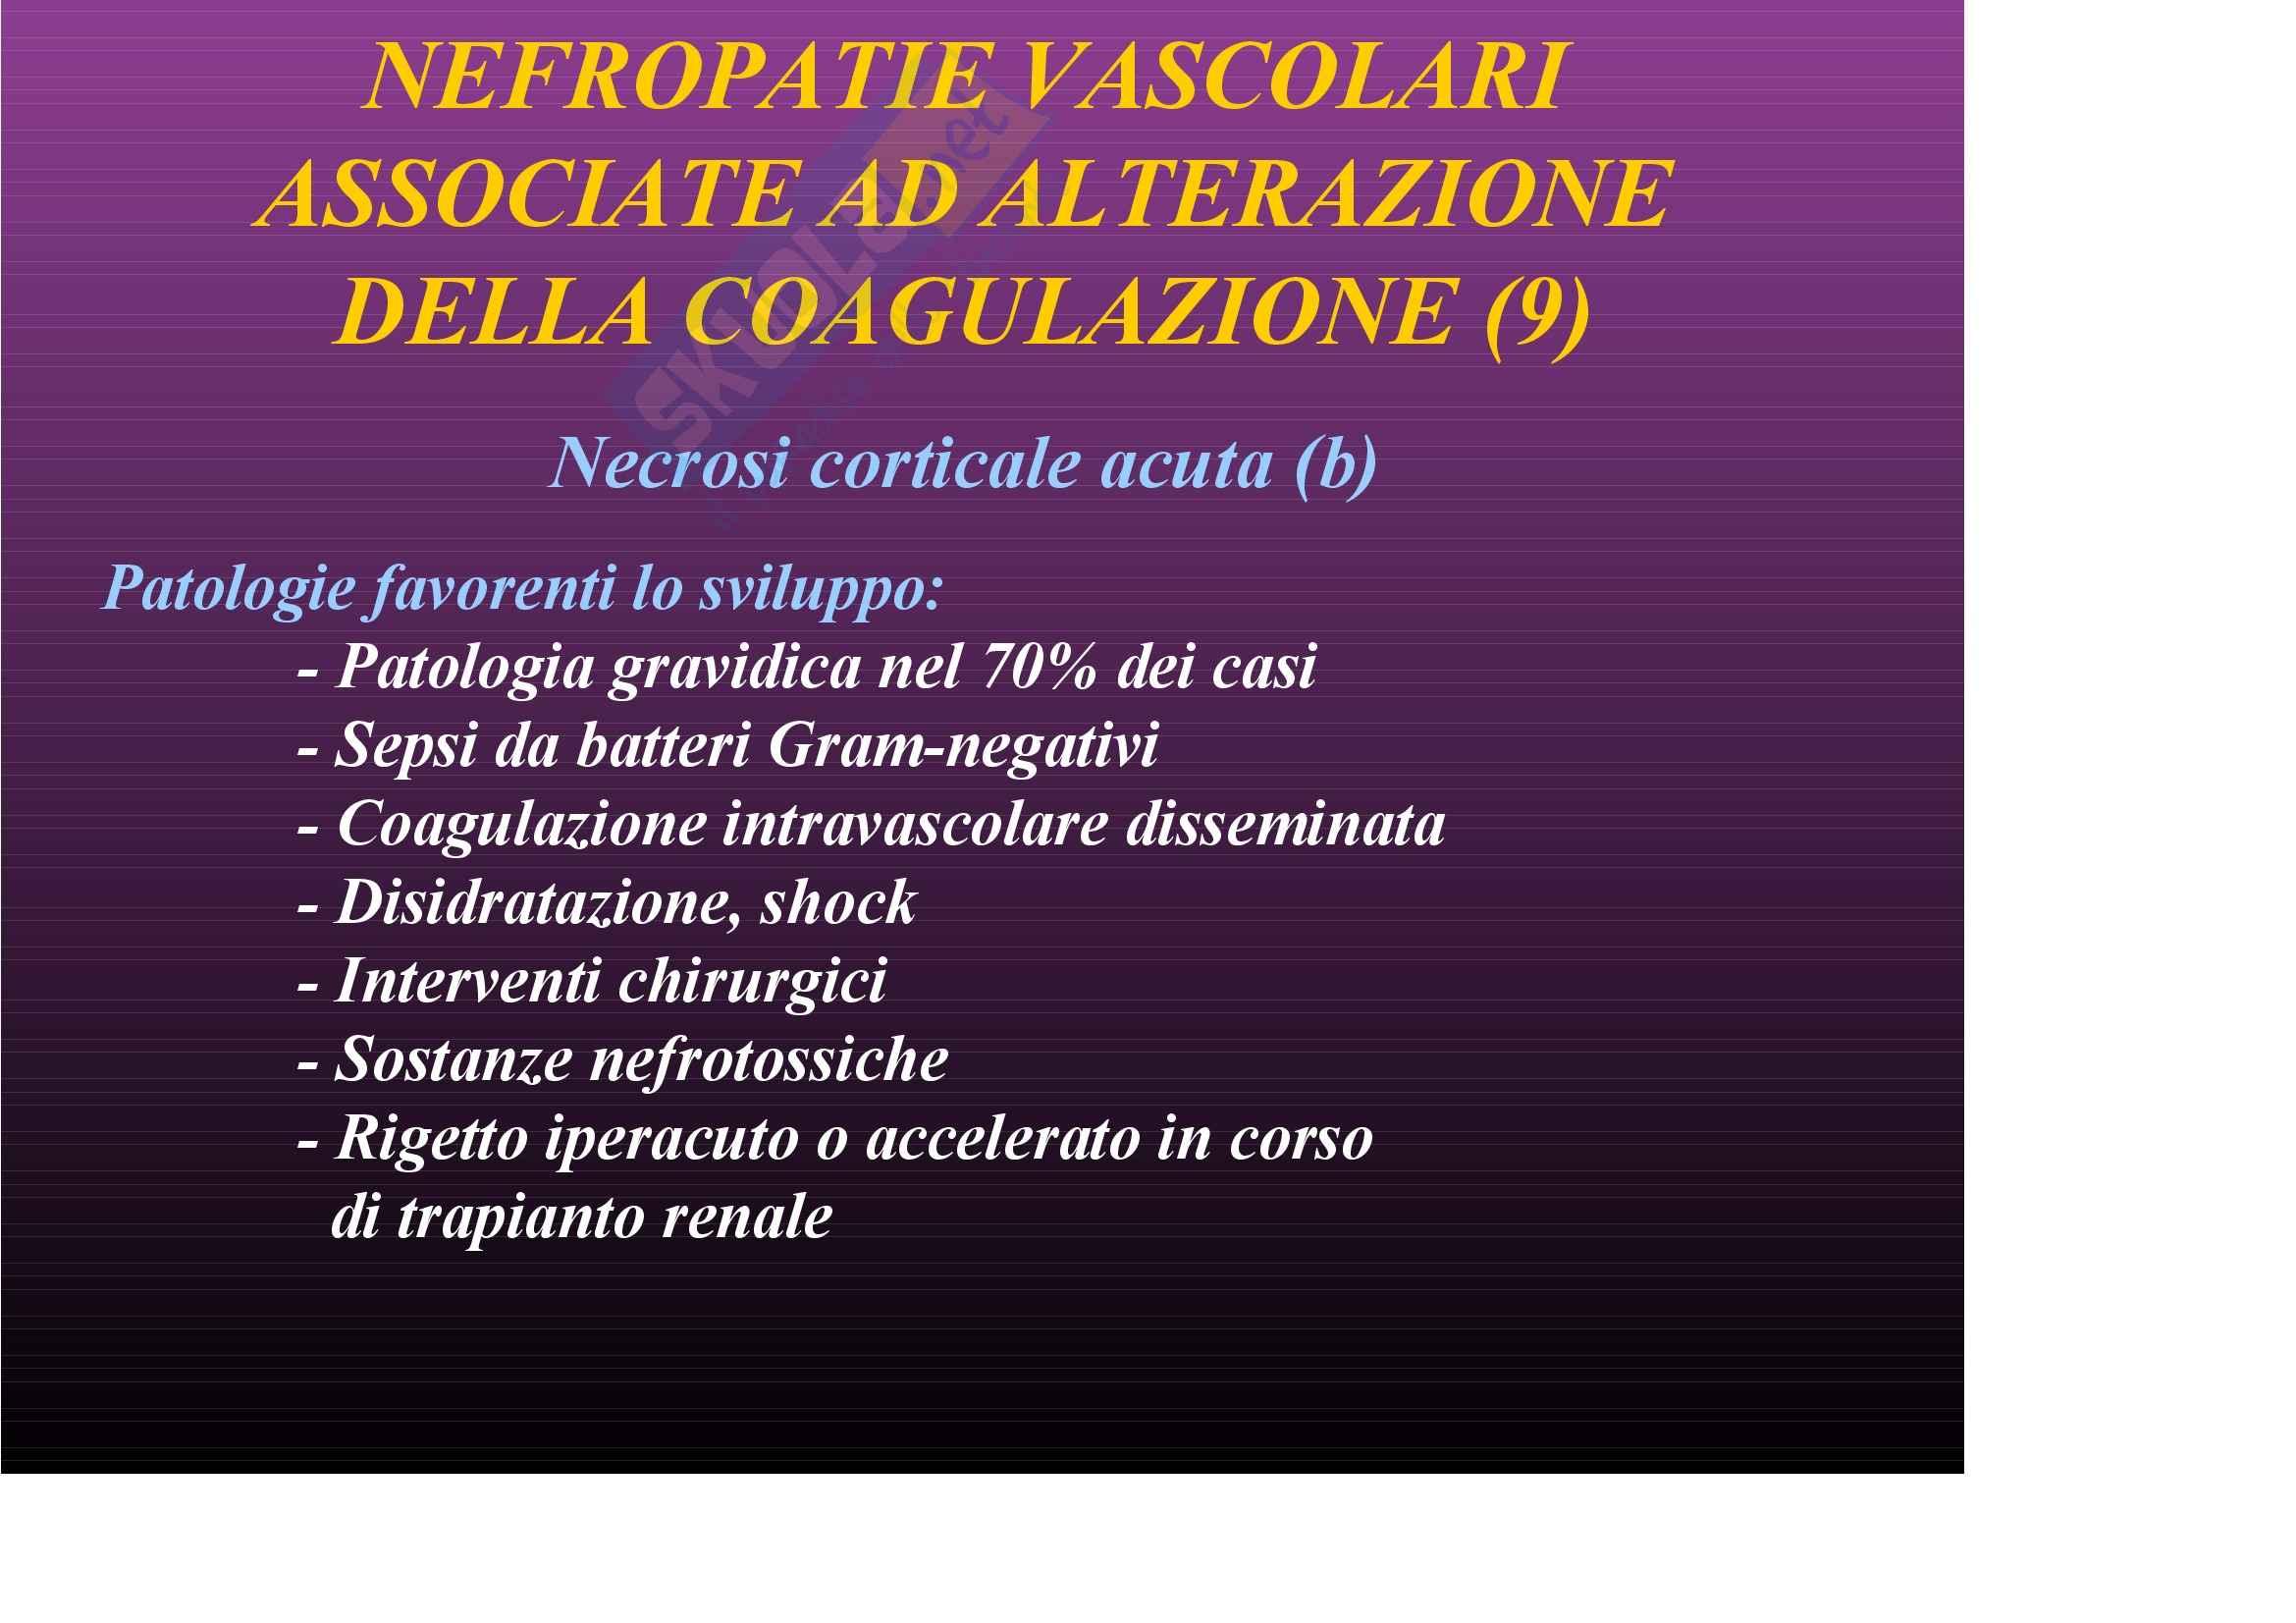 Nefrologia e urologia – Nefropatie vascolari Pag. 51